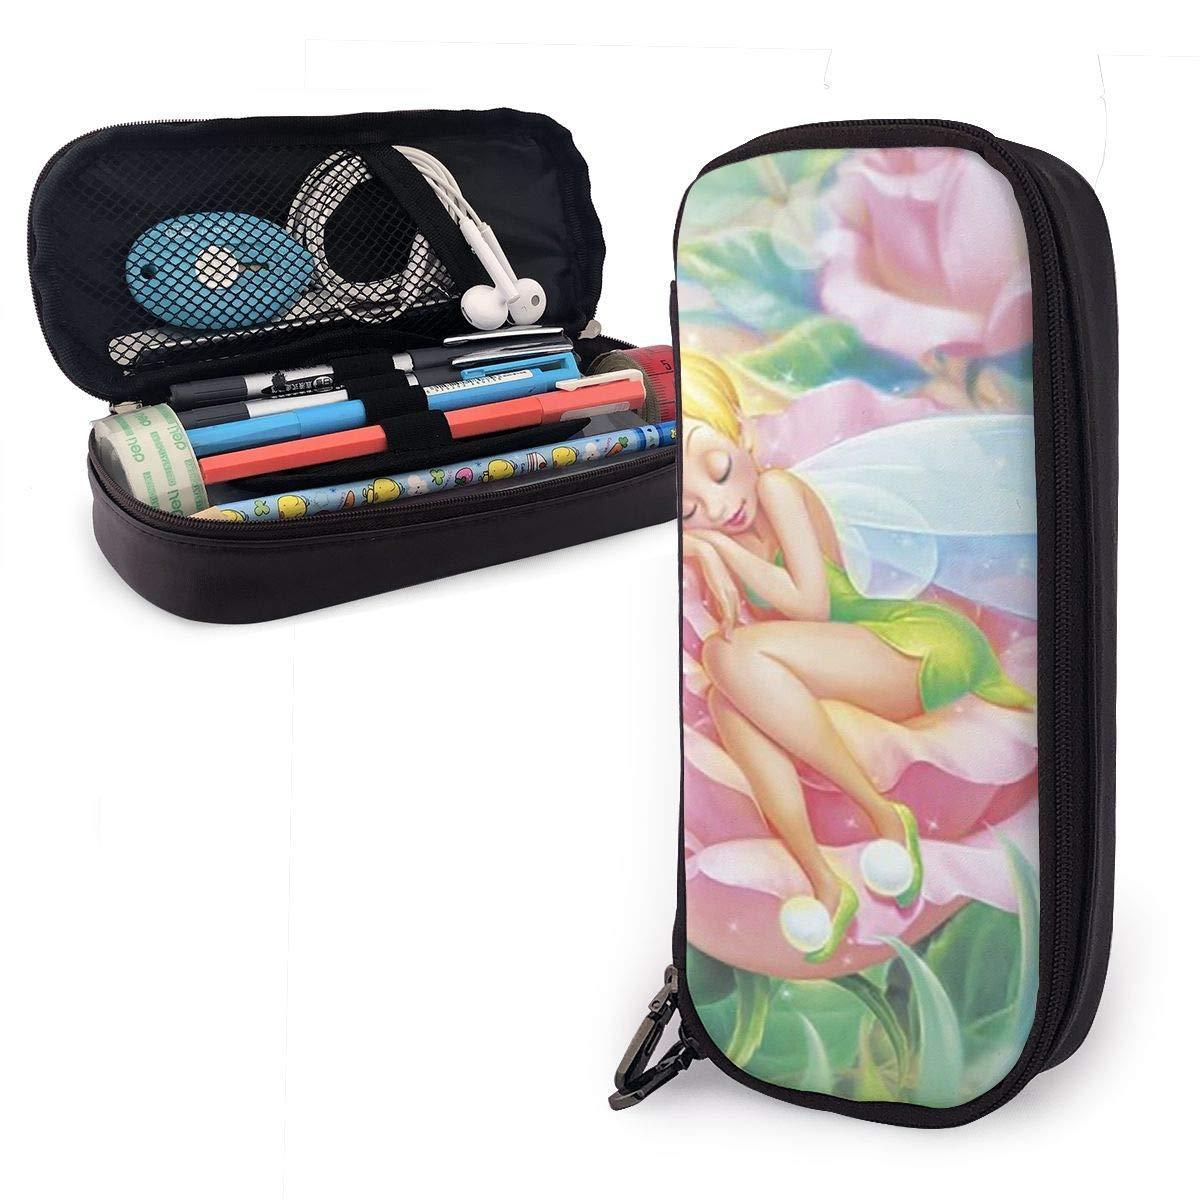 Estuche para lápices Tinkerbell para dormir Bolso para lápices de gran capacidad Maquillaje Estuche para bolígrafos Papelería con doble cremallera Portalápices para escuela/oficina: Amazon.es: Oficina y papelería